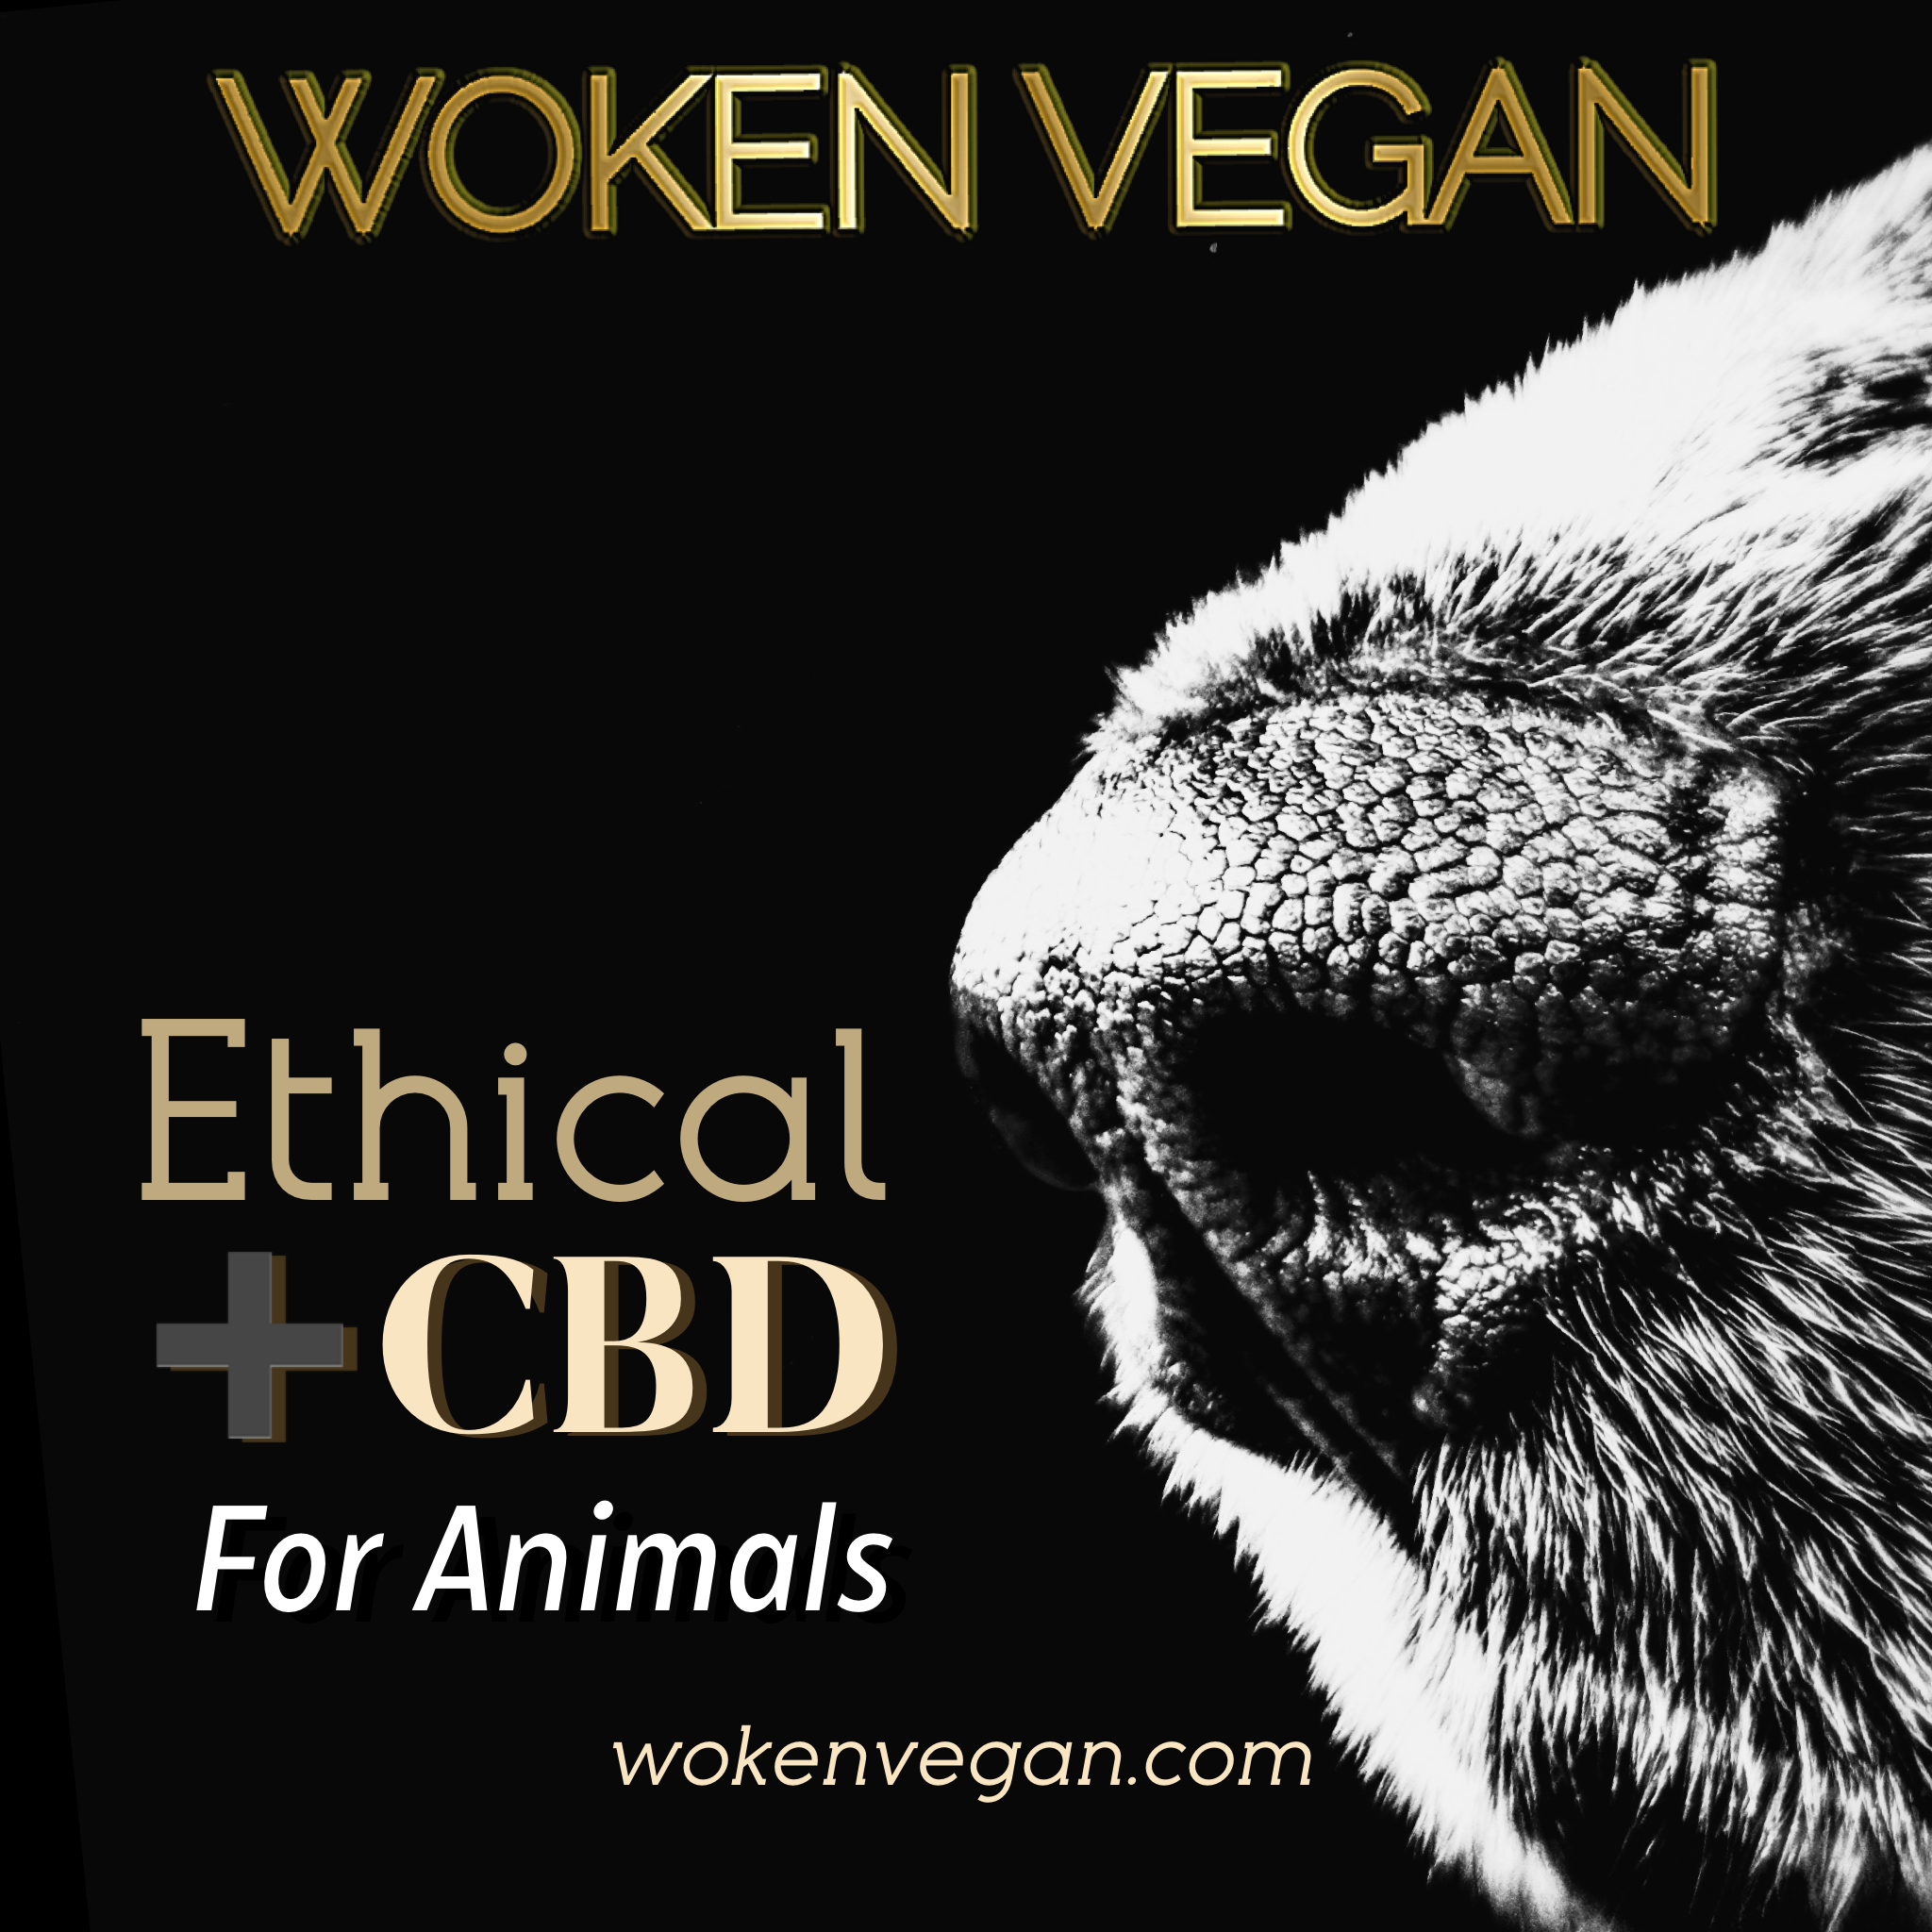 ethical CBD Woken Vegan